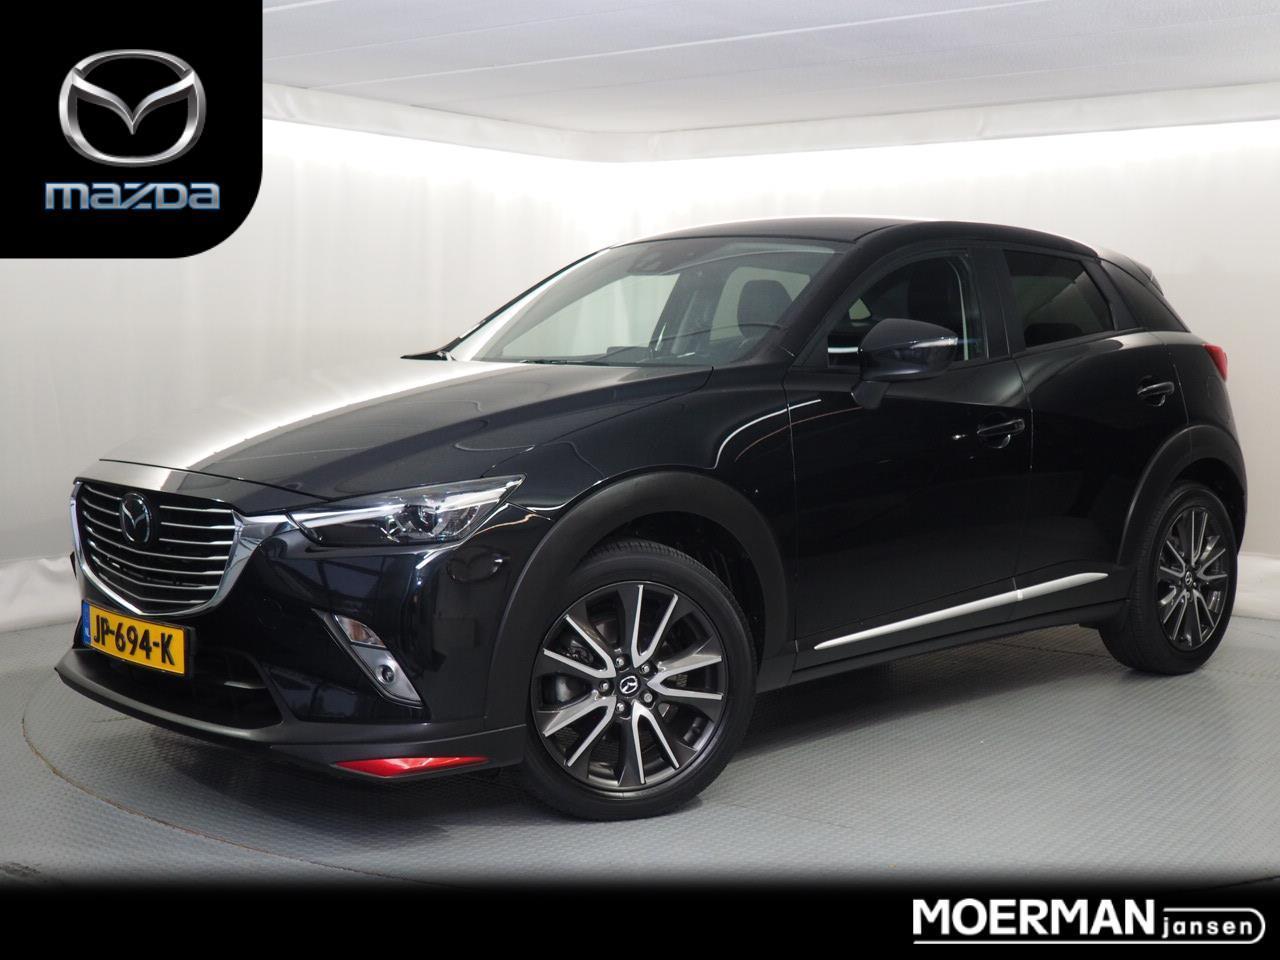 Mazda Cx-3 2.0 gt-m / radar cruise control / head-up display / parkeersensoren + camera / 42.000km / 1e eigenaar